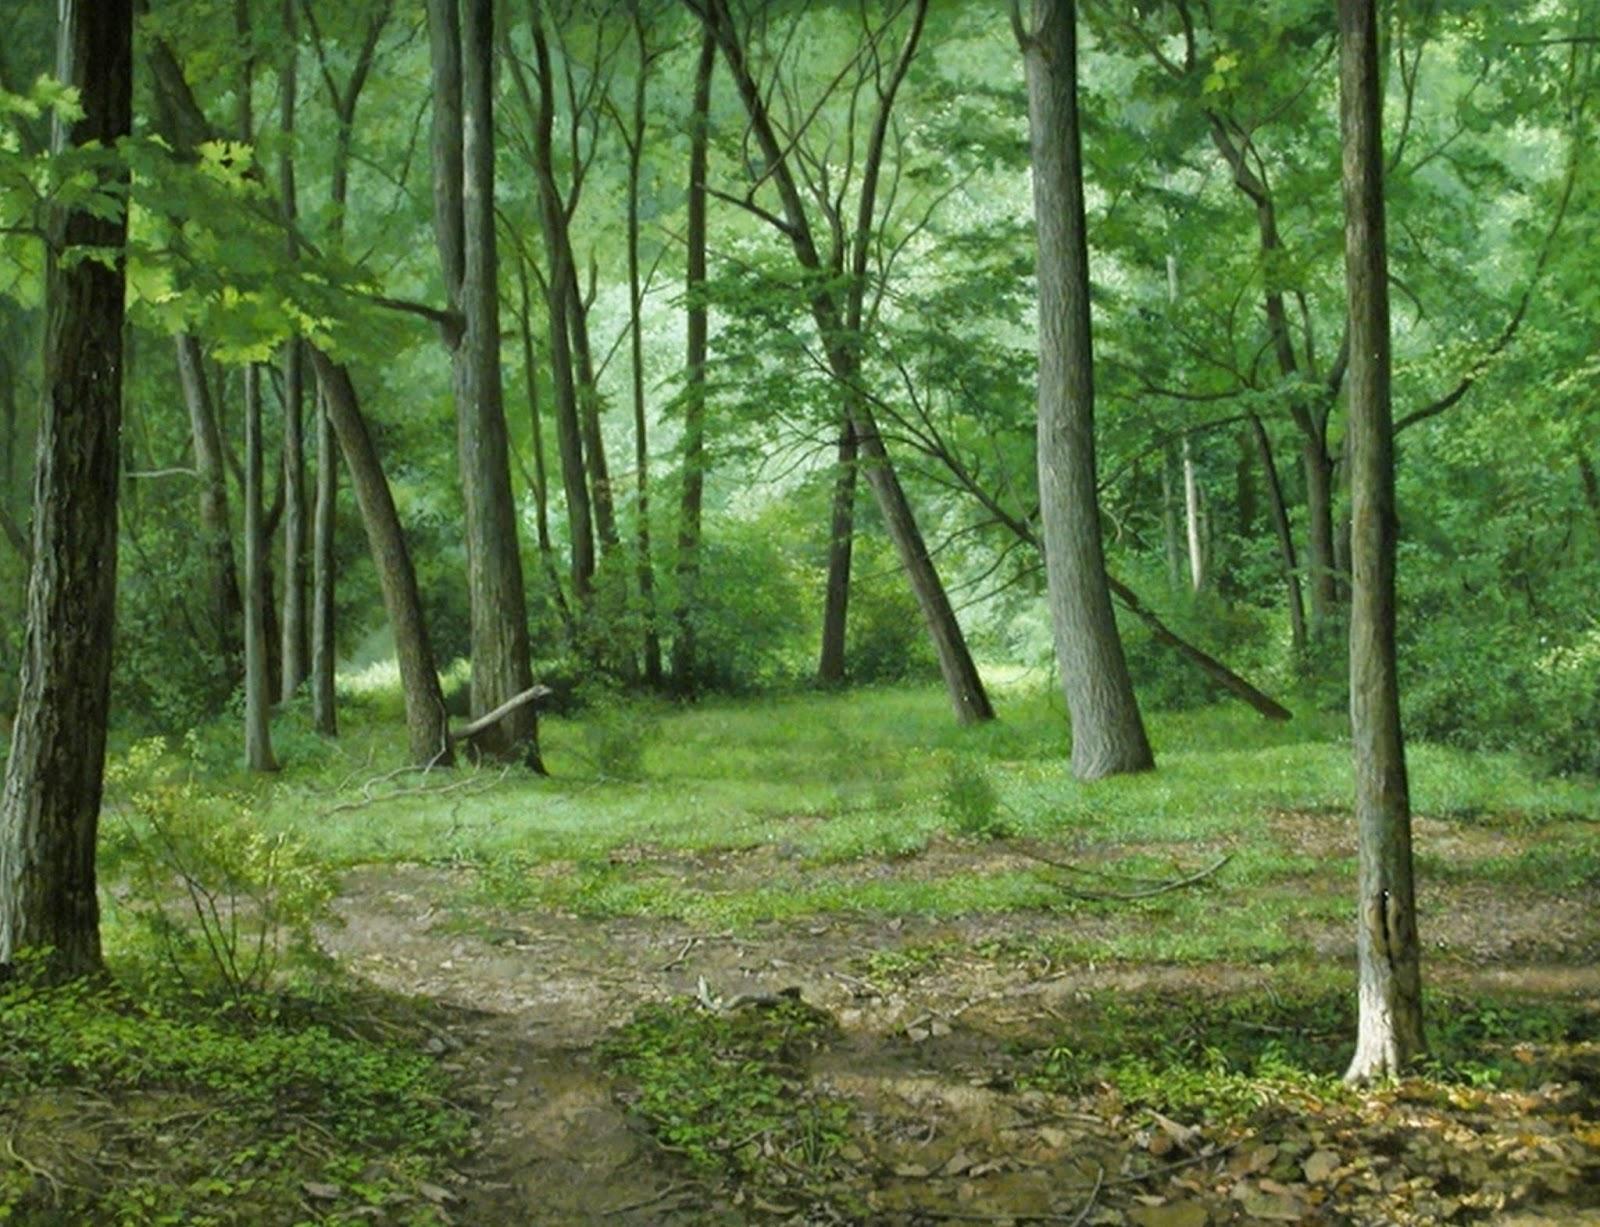 paisajes-naturales-en-pinturas-hiperrealistas